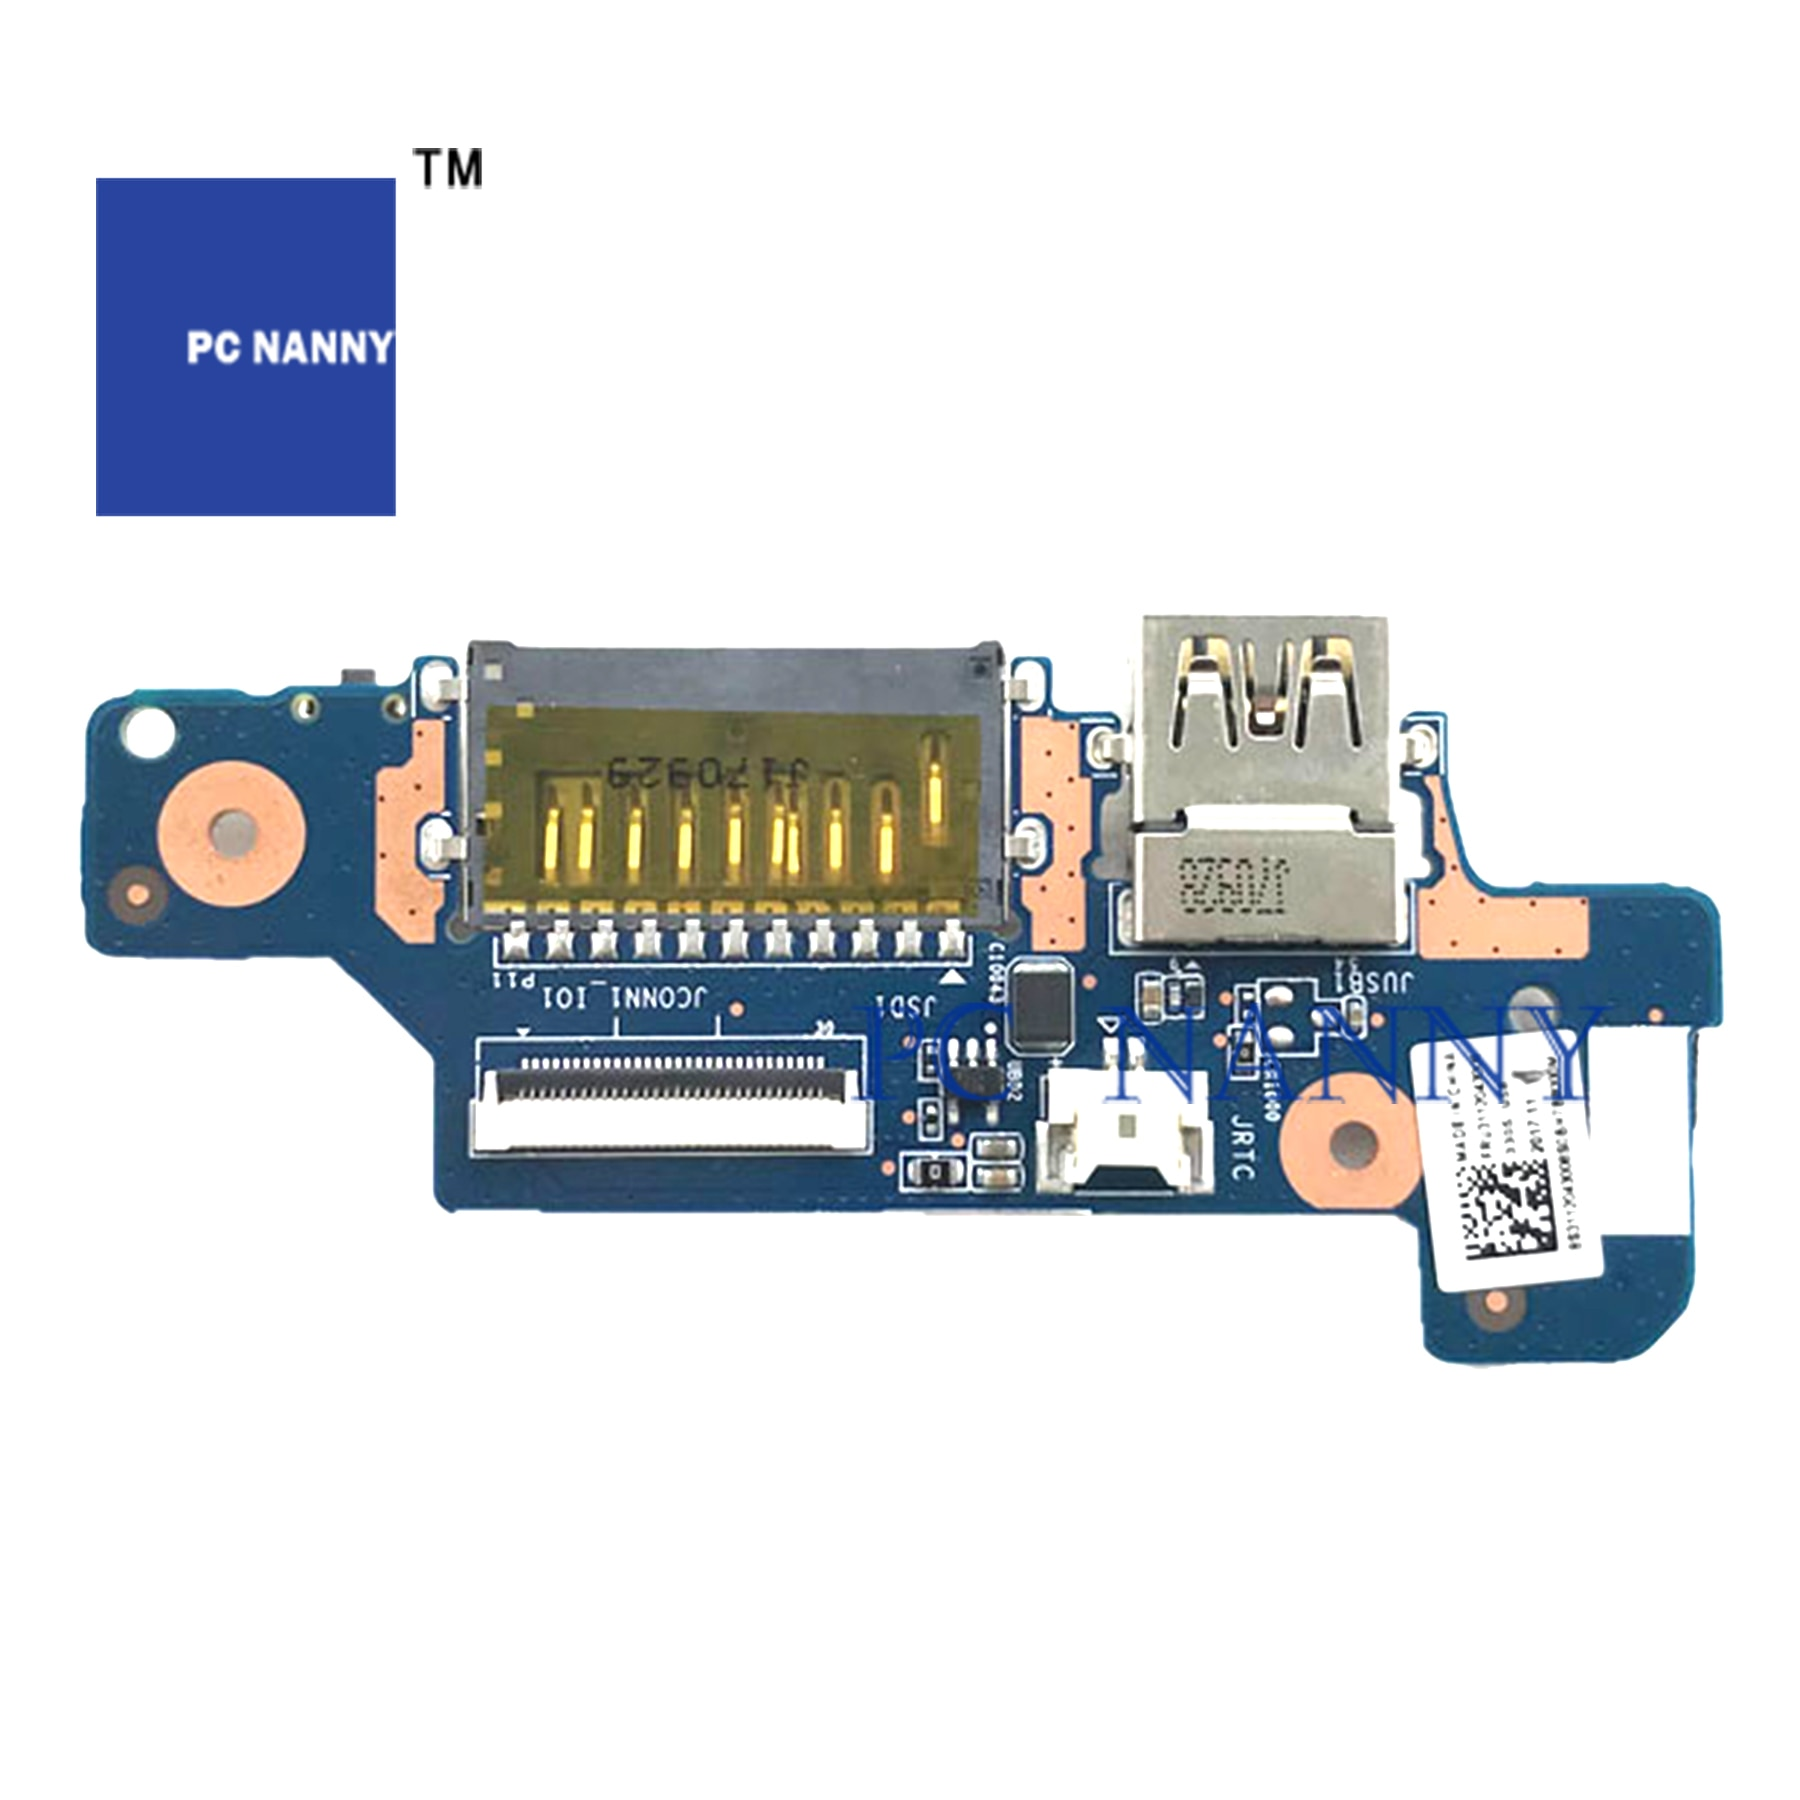 Pcnوالماني لجهاز lenovo Ideapad330S 330S USB SD BOARD 431204304010 اختبار جيد